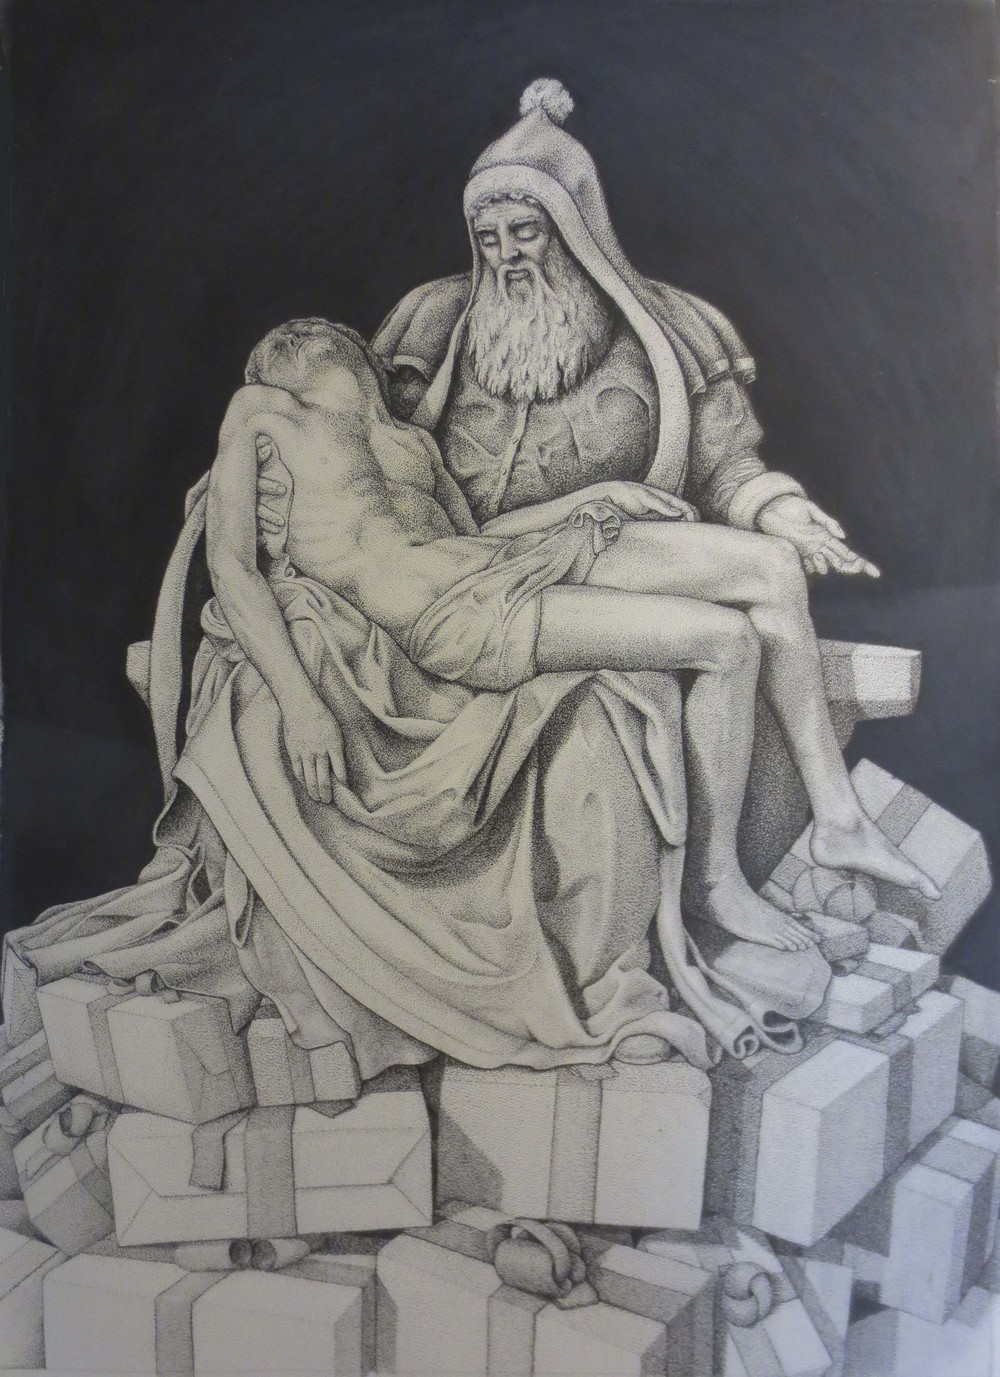 'St. Nicholas'